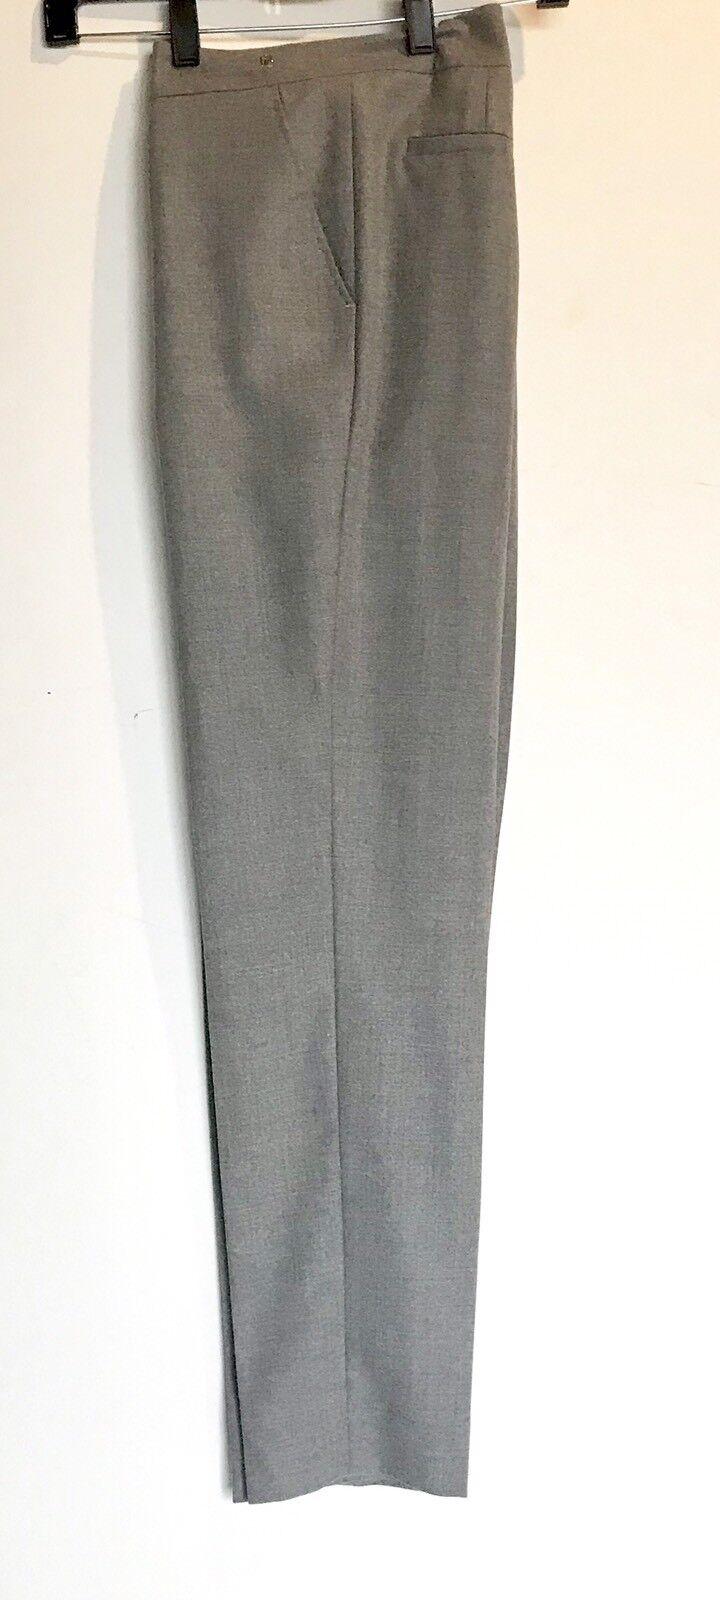 Carolina Herrera Grey Fine Wool Pant   Trouser.NWT Retail  440 Price  159 Size 2